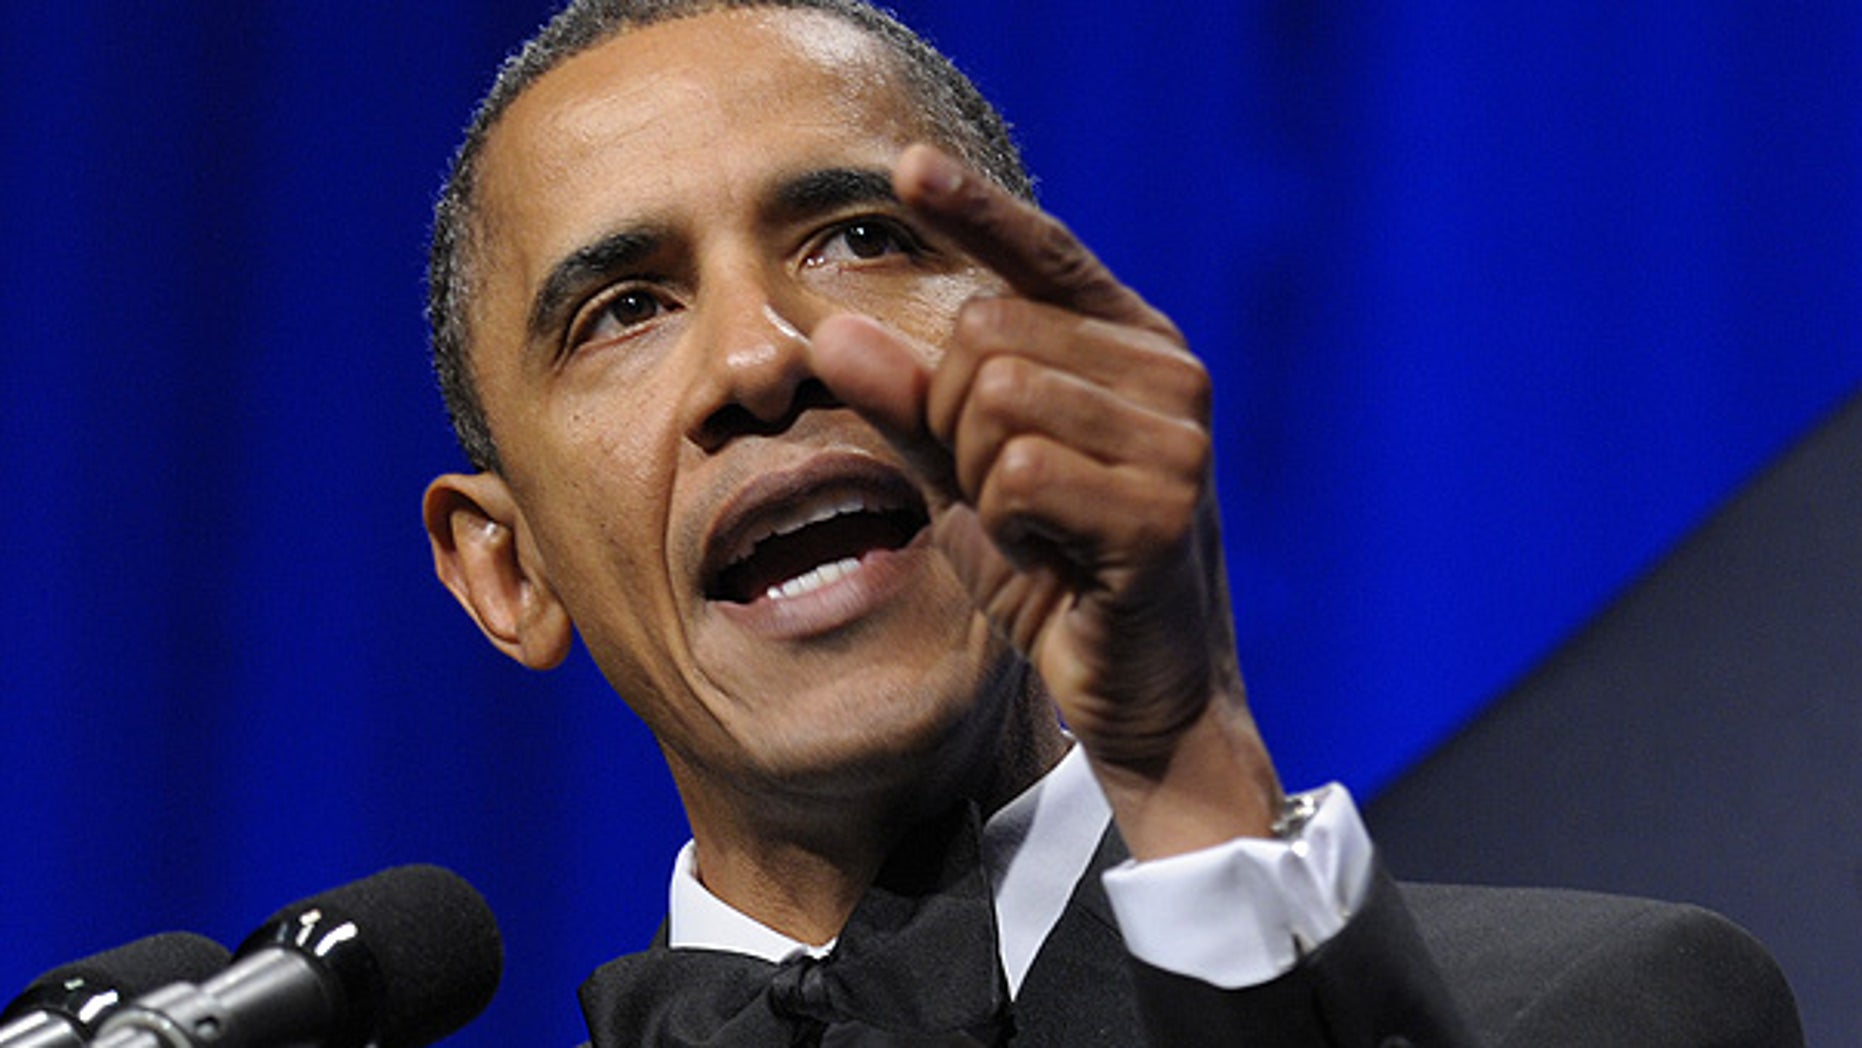 Sept. 15: President Obama speaks at the Congressional Hispanic Caucus Awards Gala in Washington.